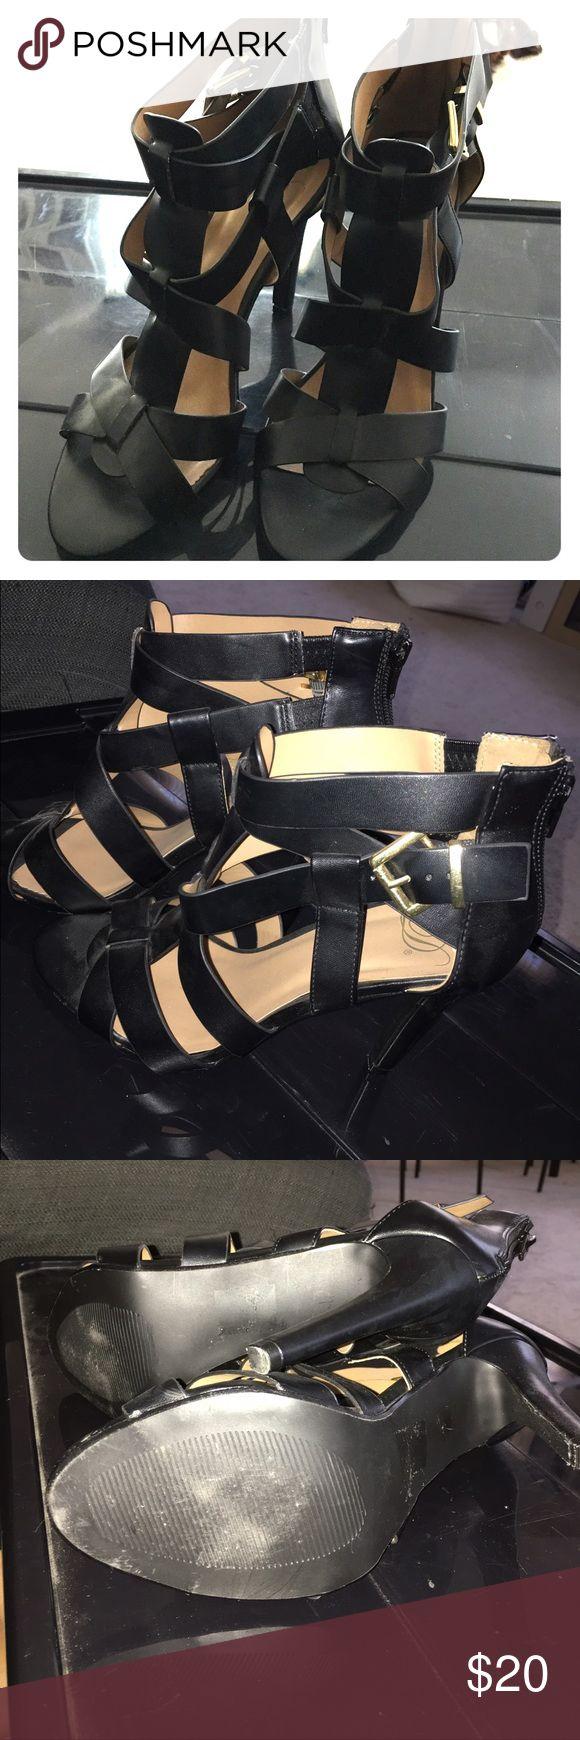 "Black gladiator sandal ~3"" heel gladiator style Shoes Heels"